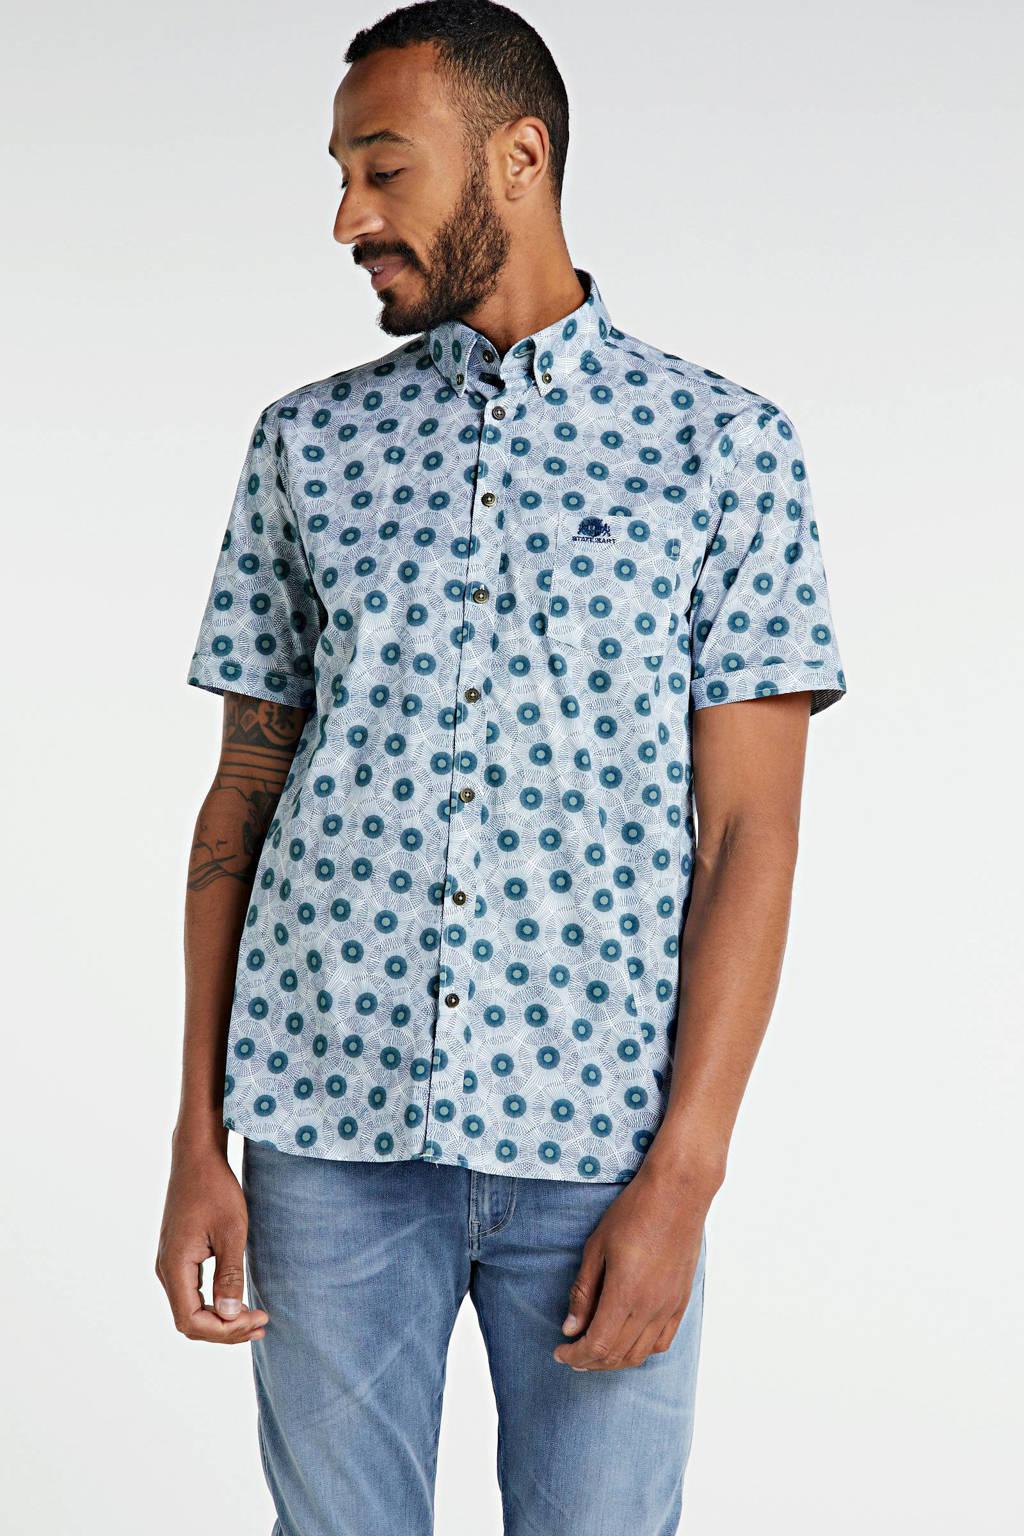 State of Art regular fit overhemd met all over print wit/groen, Wit/groen